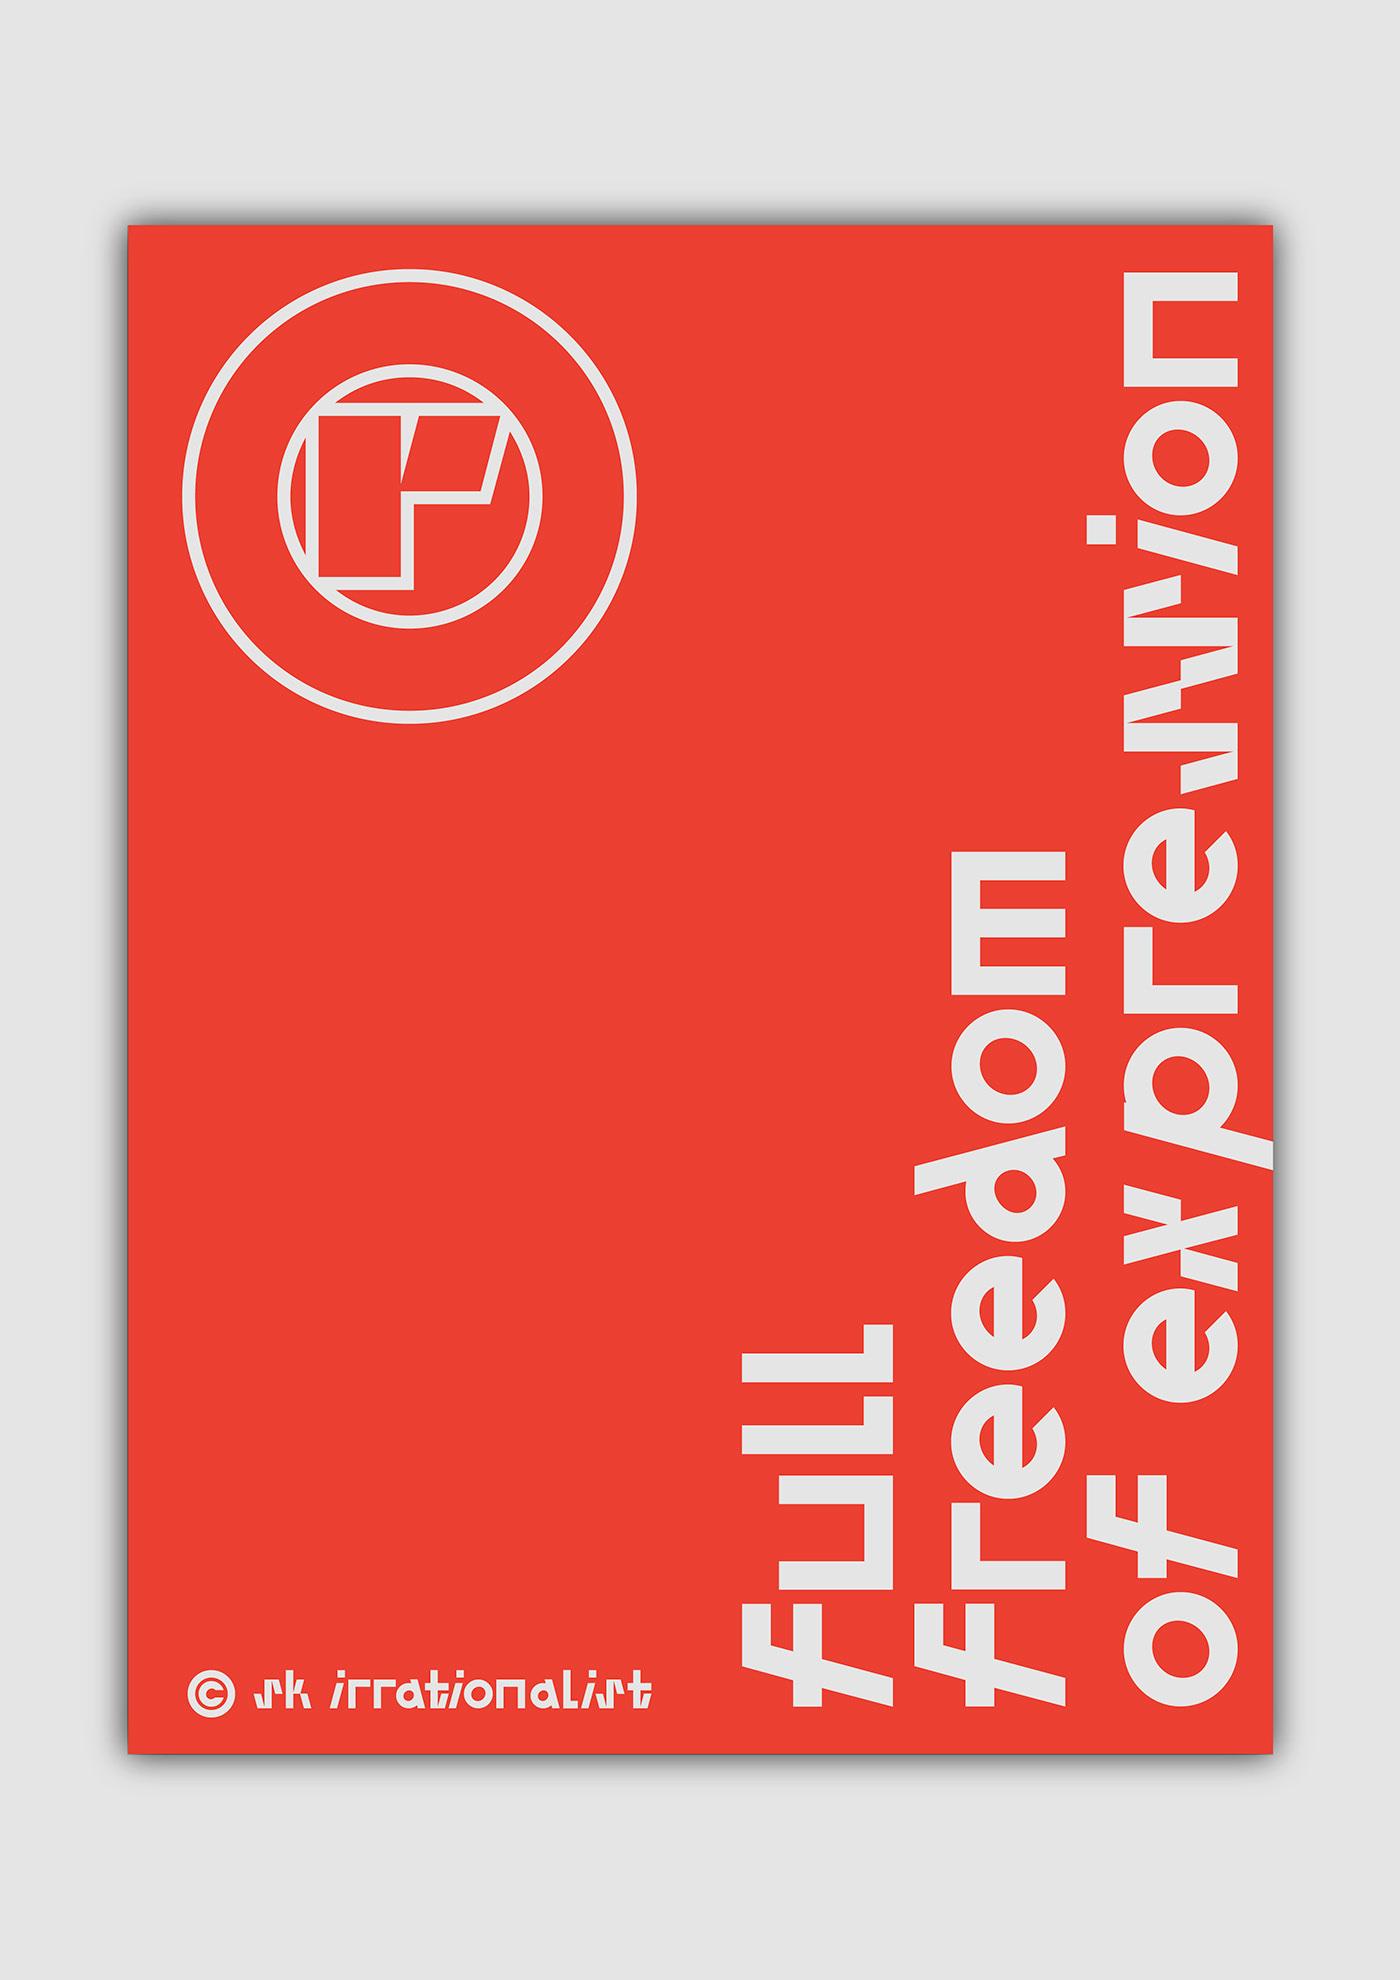 时尚艺术装饰英文字体下载 SK Irrationalist Personal License插图(9)